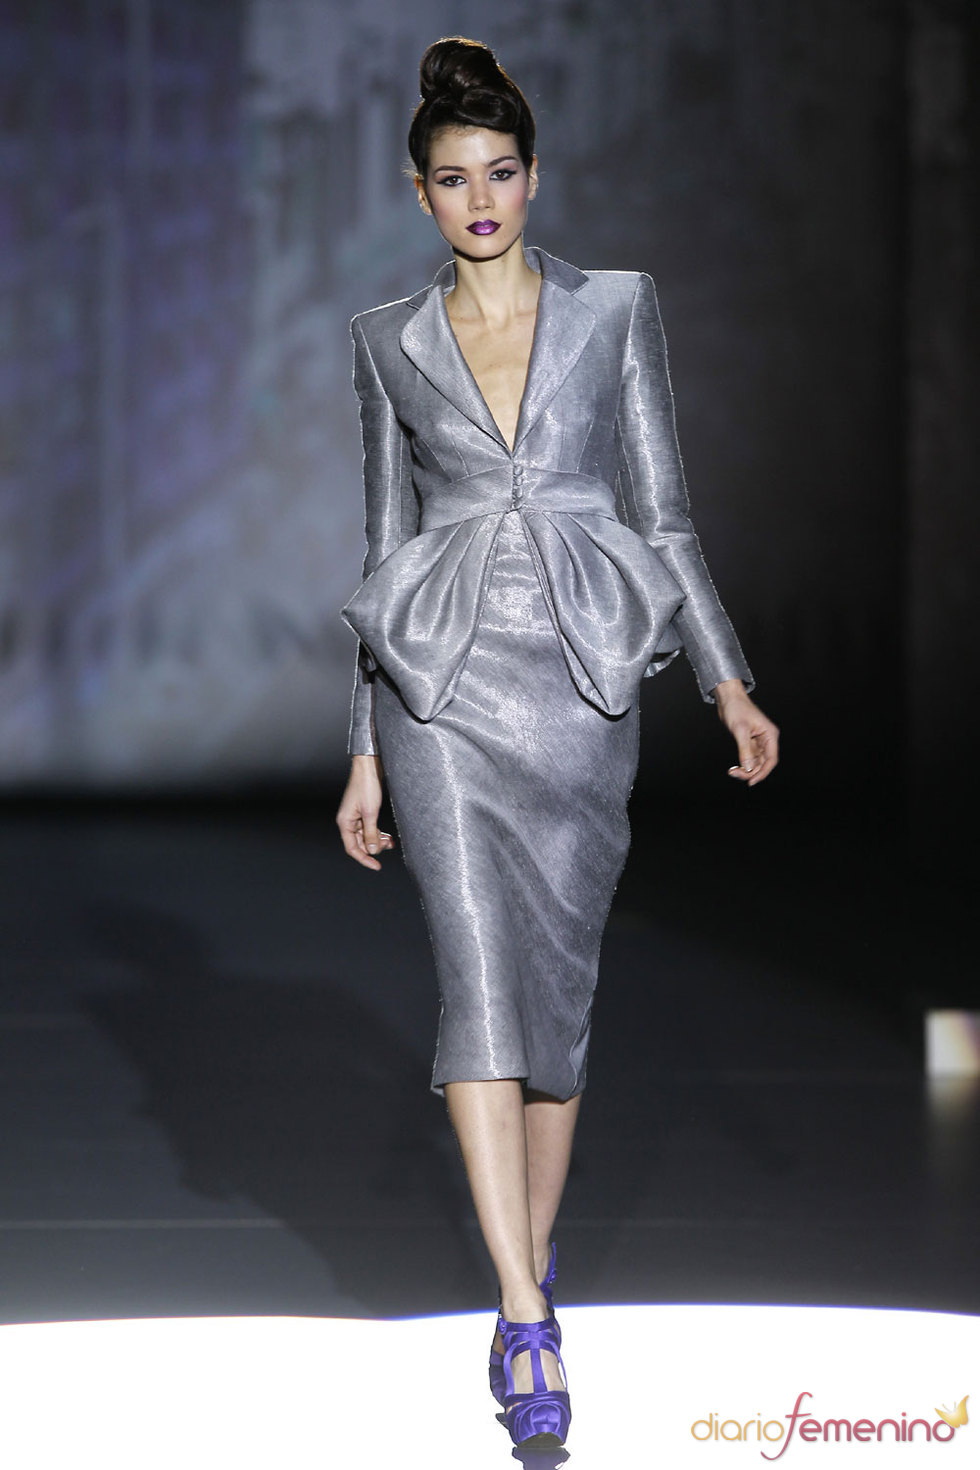 Hannibal Laguna - Cibeles Fashion Week 2010